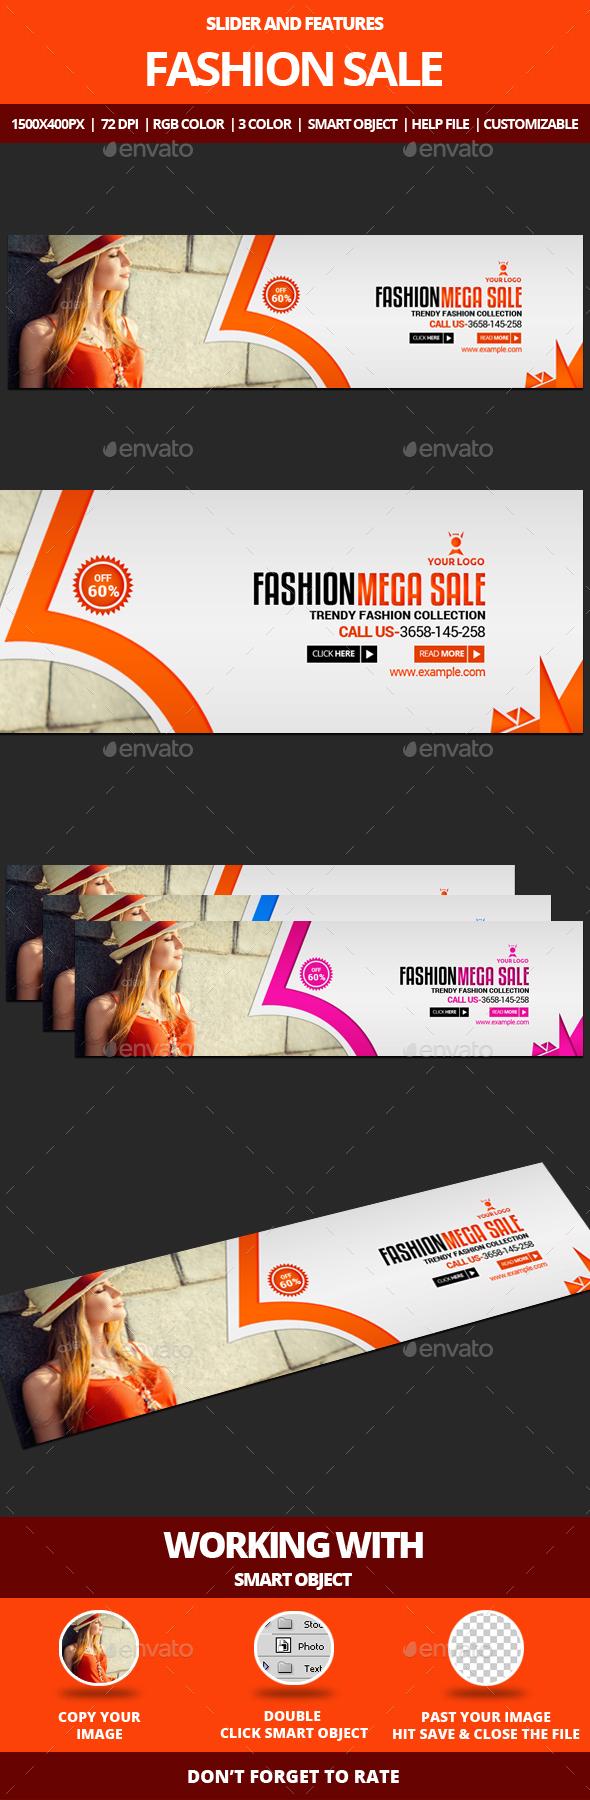 Fashion Sale Slider - Sliders & Features Web Elements